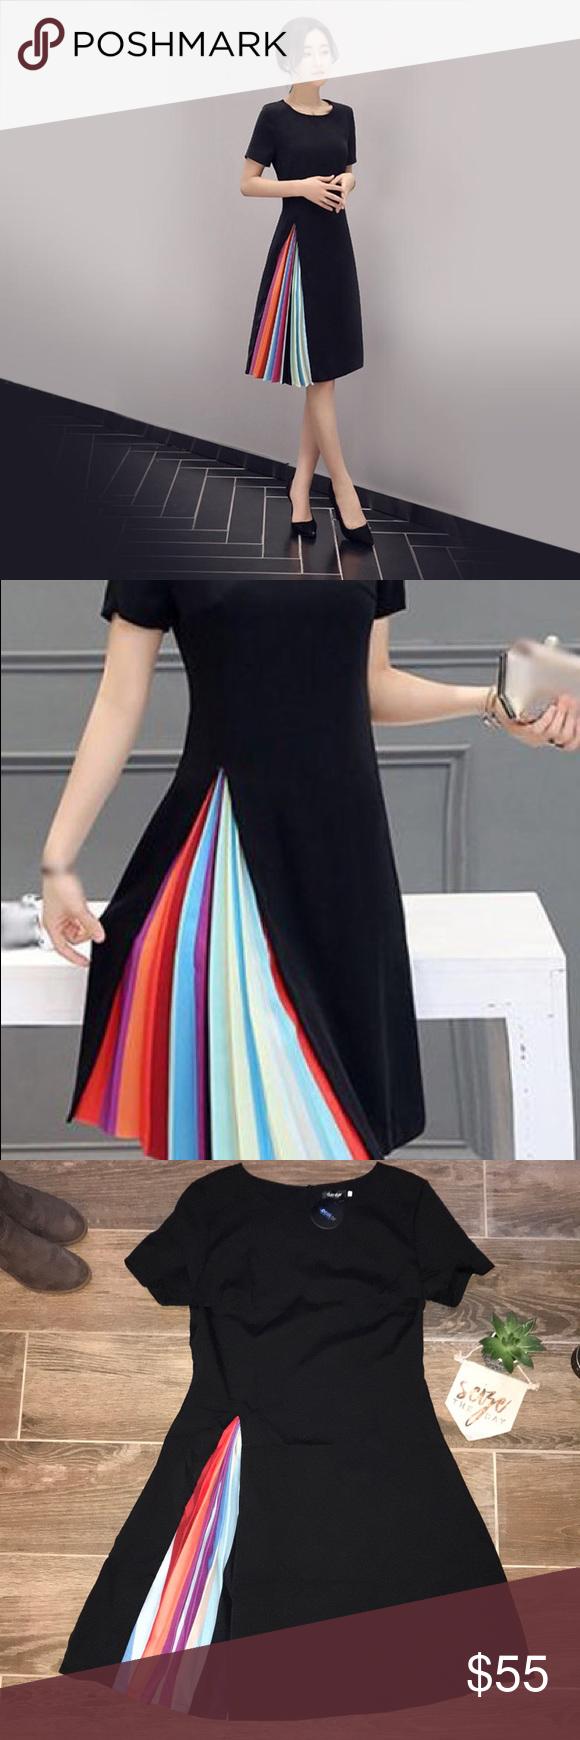 Nwt Hidden Pleated Rainbow Block Dress Nwt Block Dress